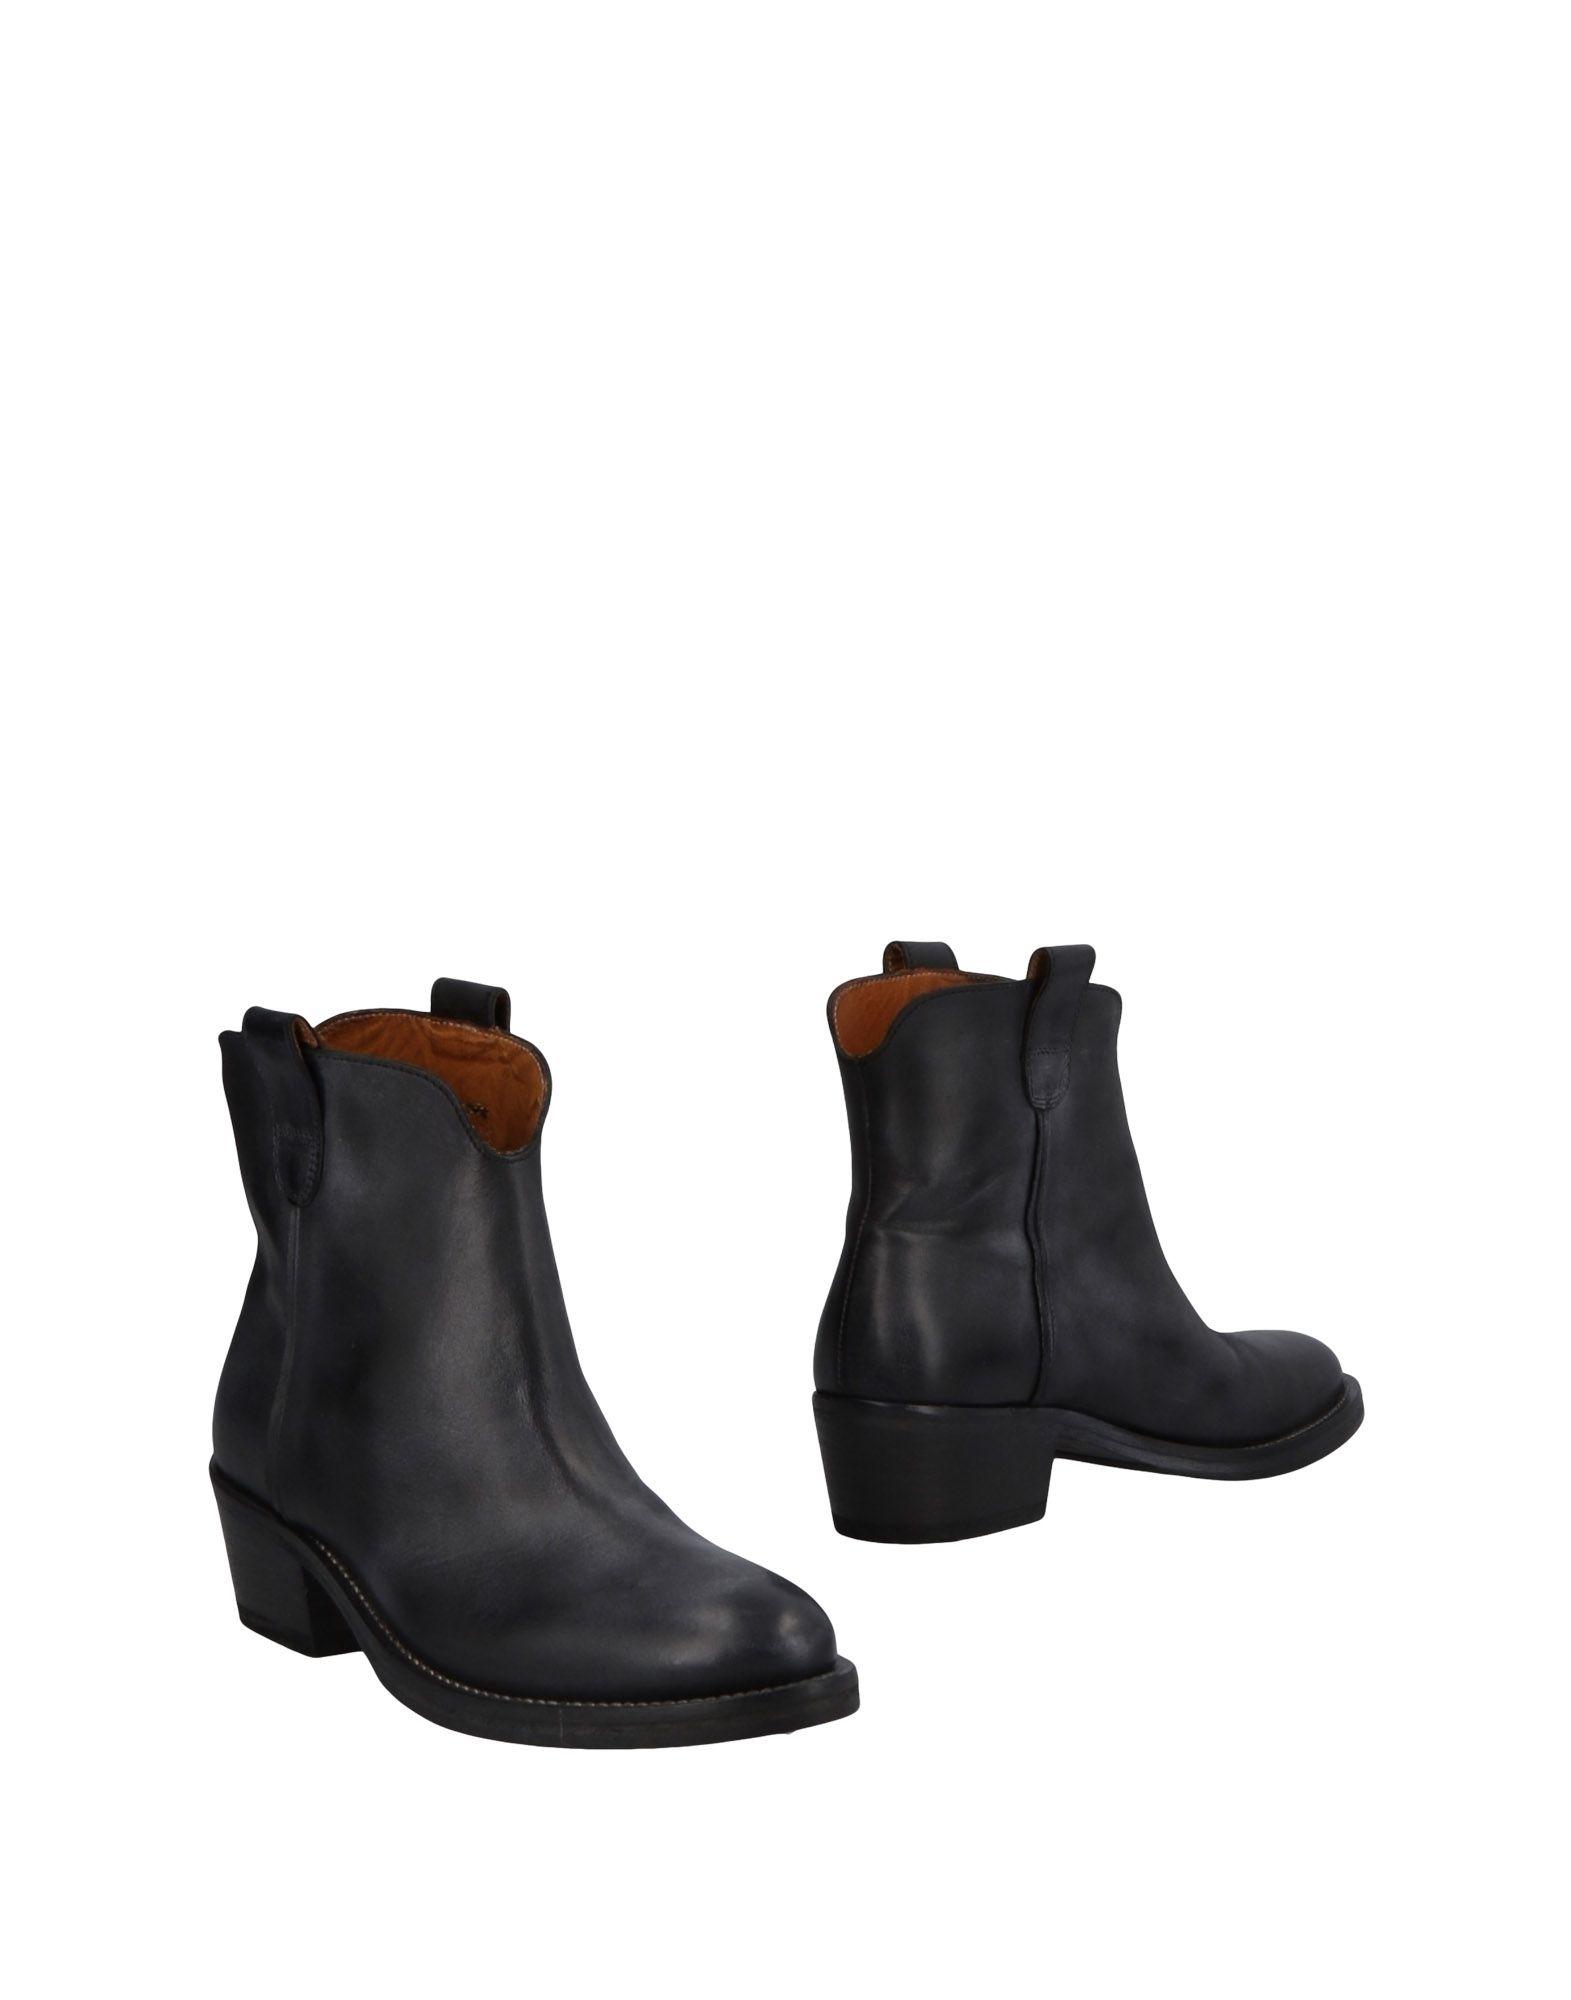 Stilvolle Stilvolle Stilvolle billige Schuhe Seboy's Stiefelette Damen  11494666OE 93f7fe